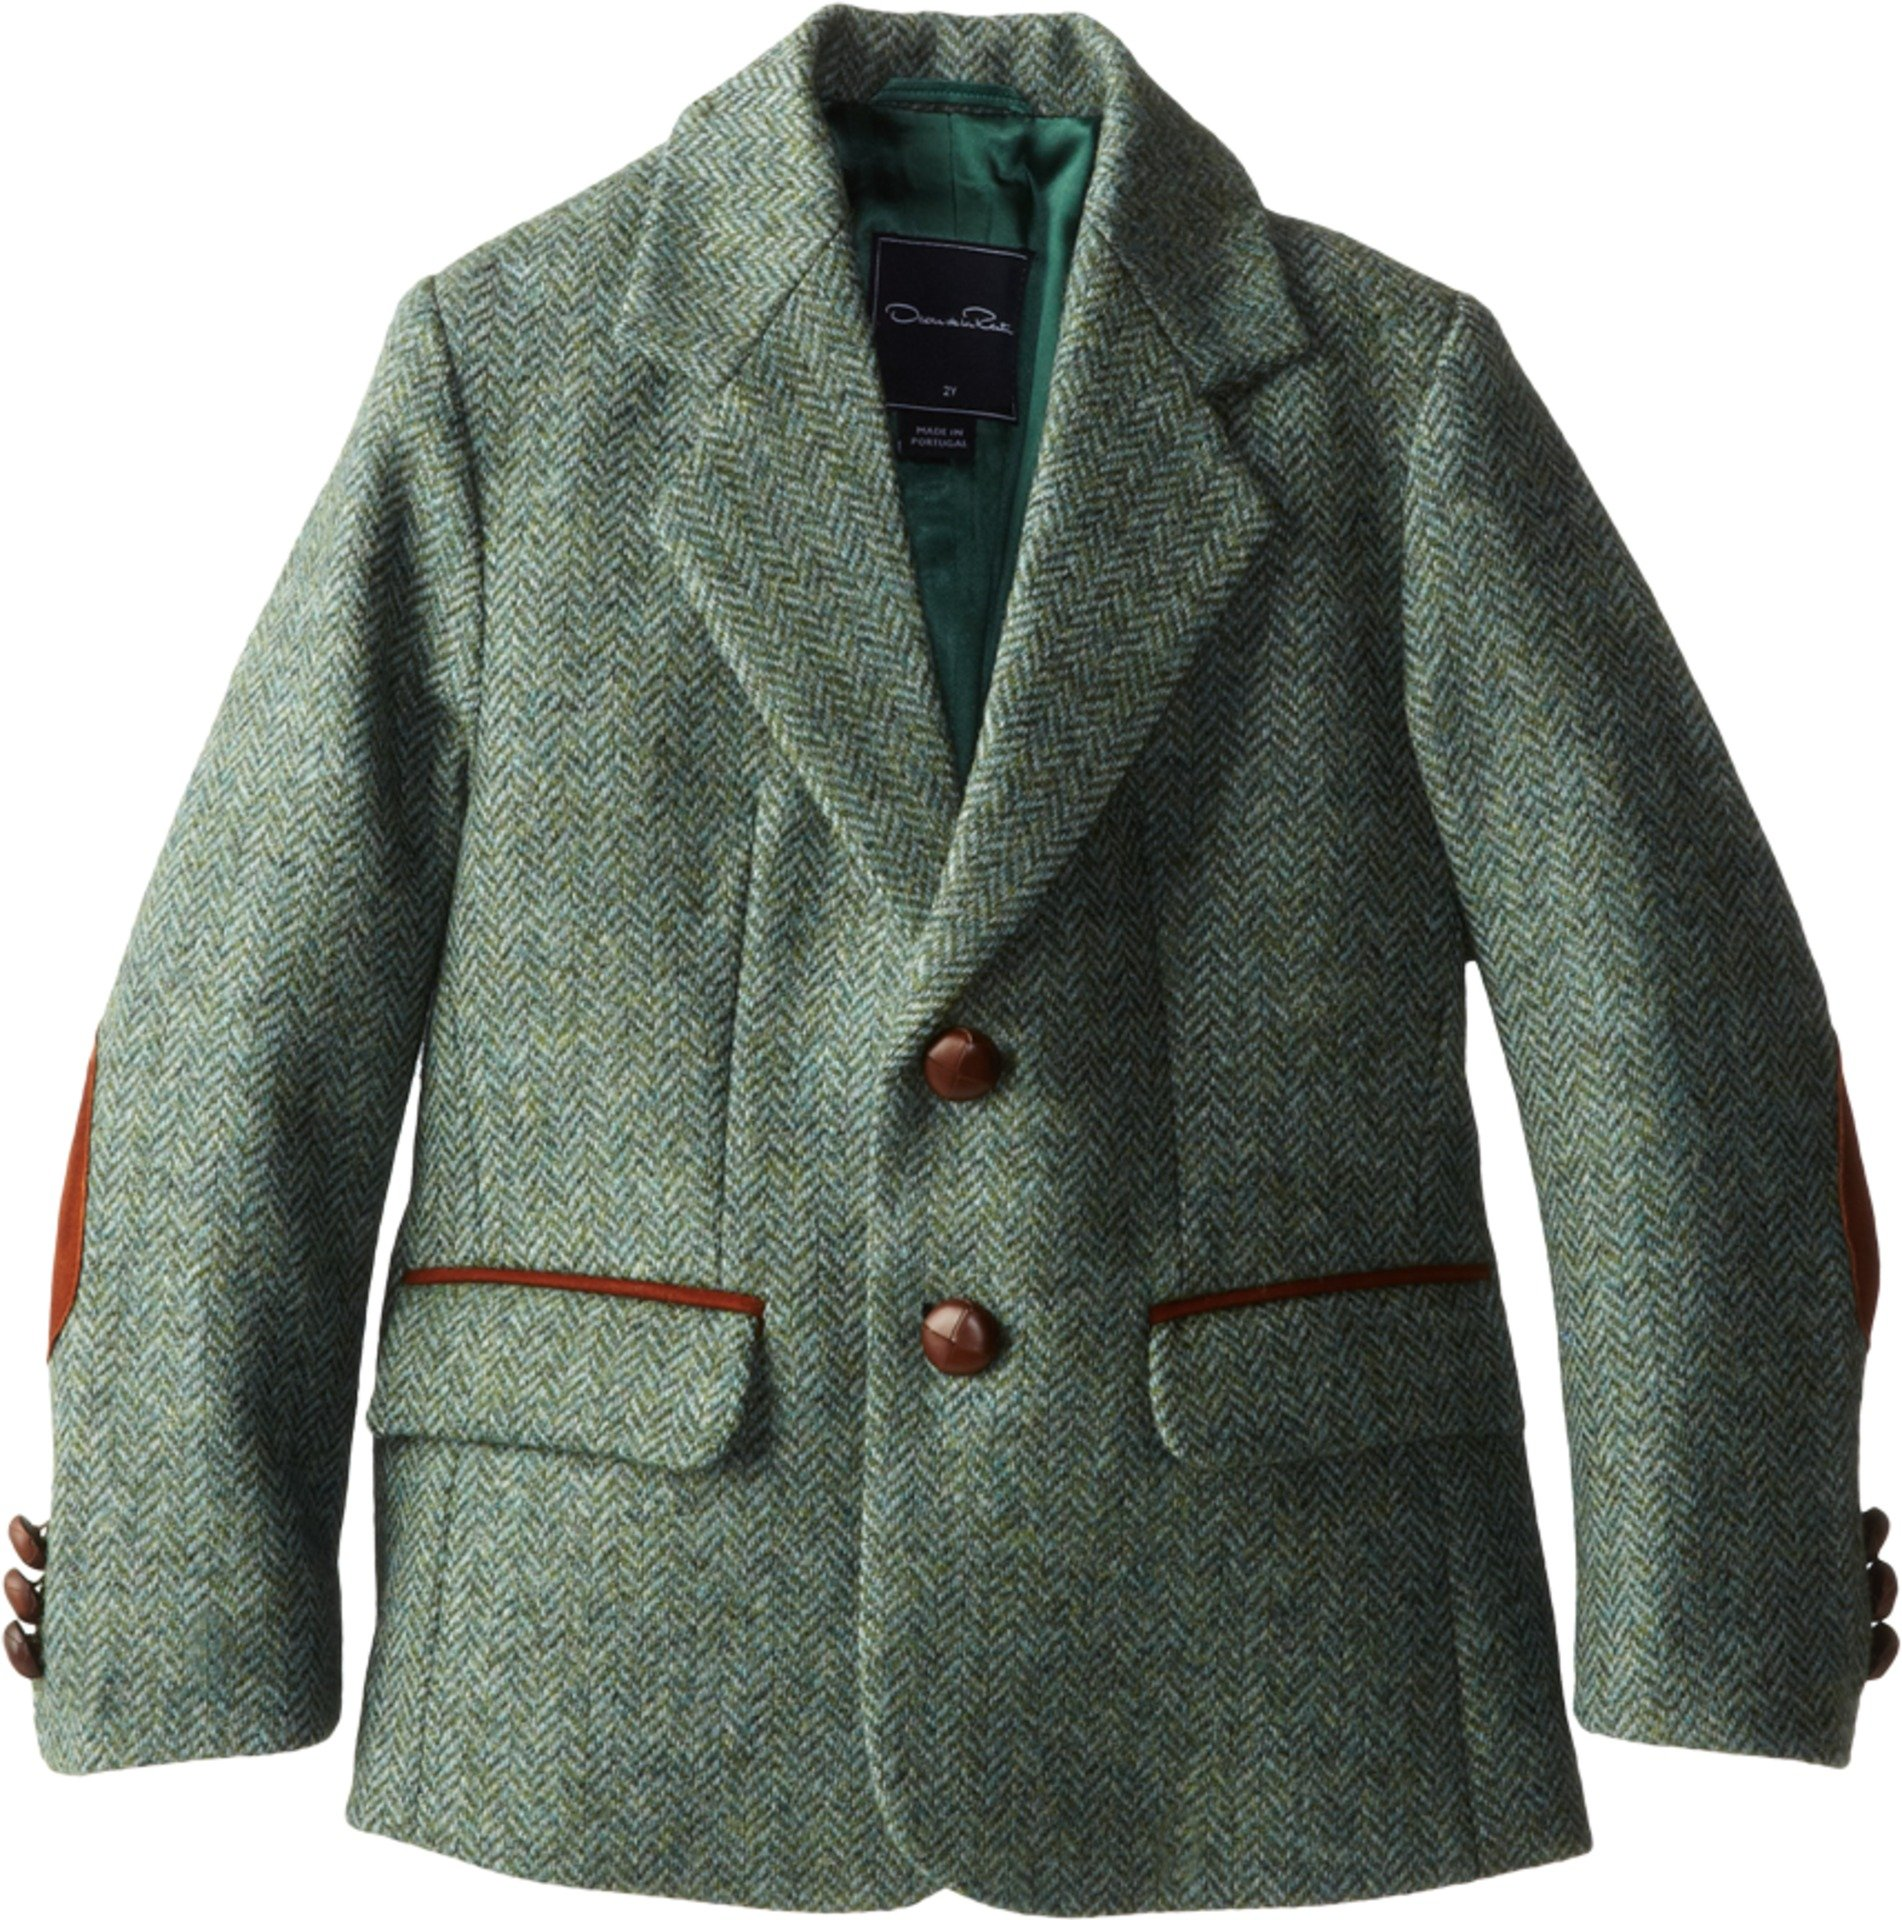 Oscar de la Renta Childrenswear Boy's Tweed Blazer (Toddler/Little Kids/Big Kids) Laurel Jacket 4 (Toddler) by Oscar de la Renta